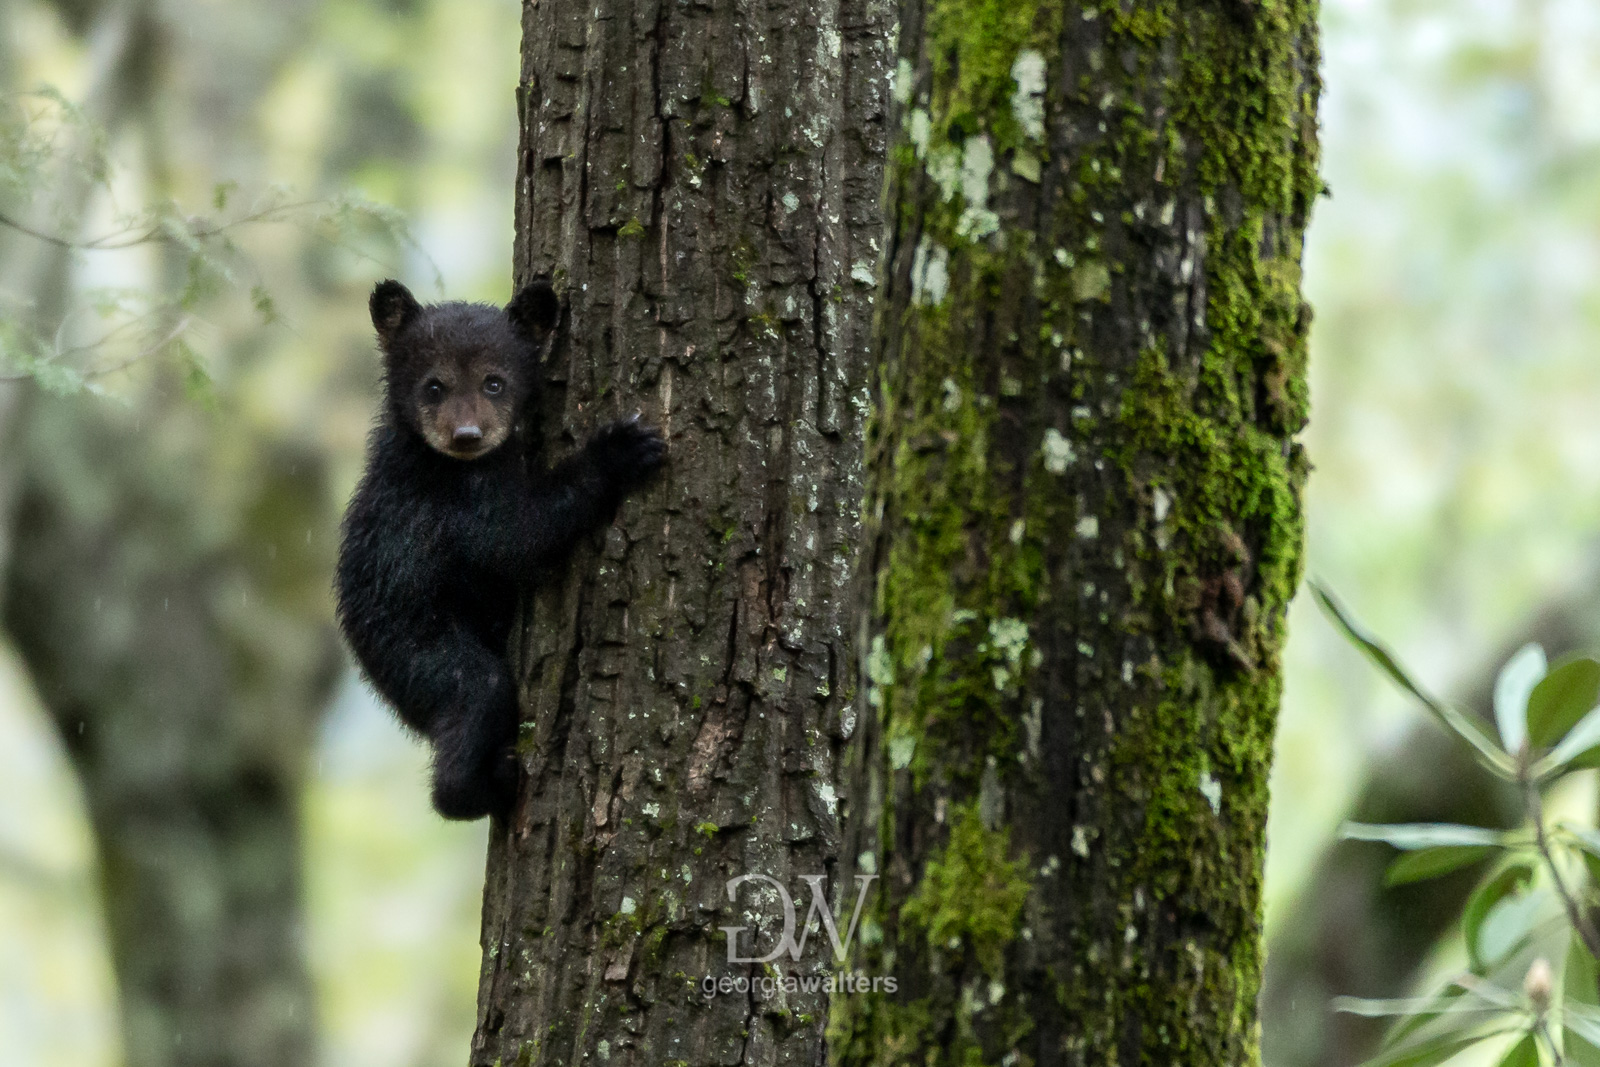 Black bear cub climbing up the side of a tree.